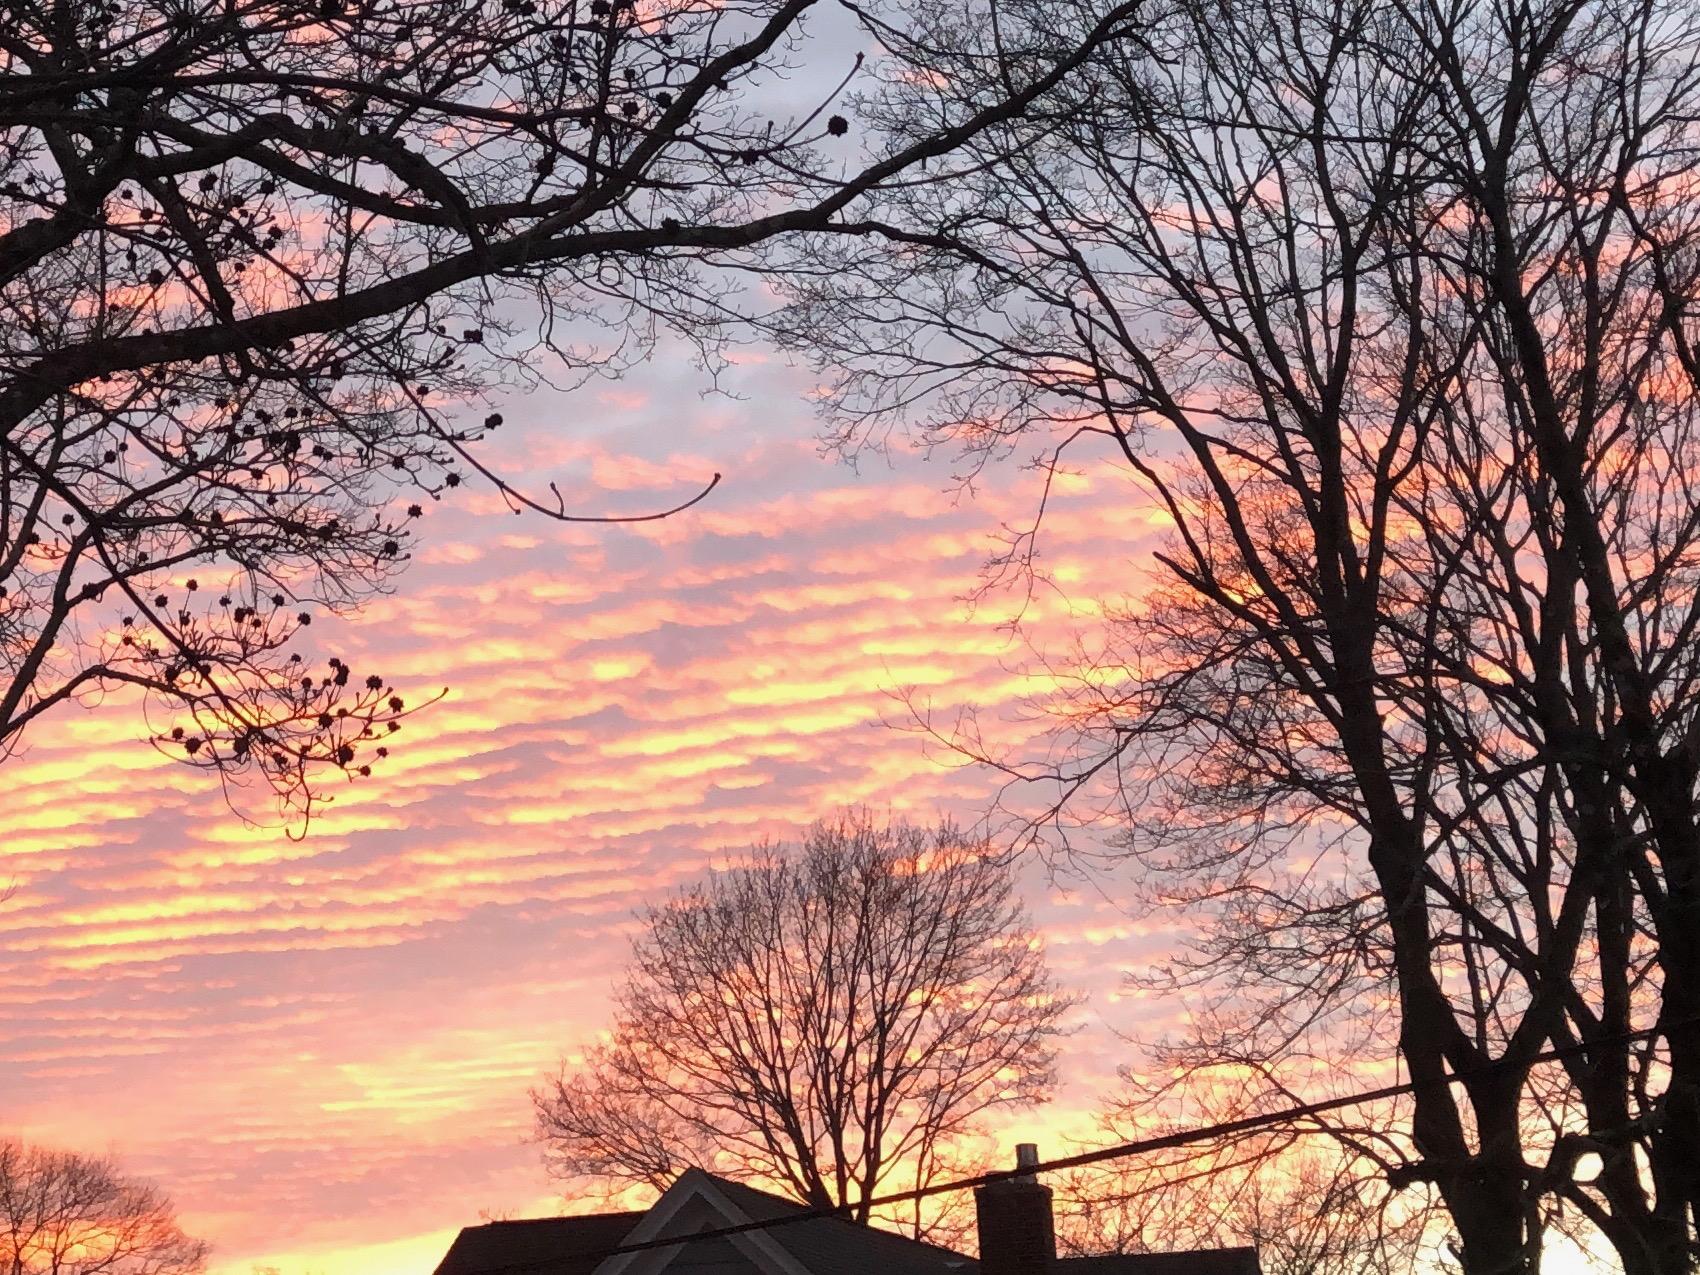 010219-striated-sunrise